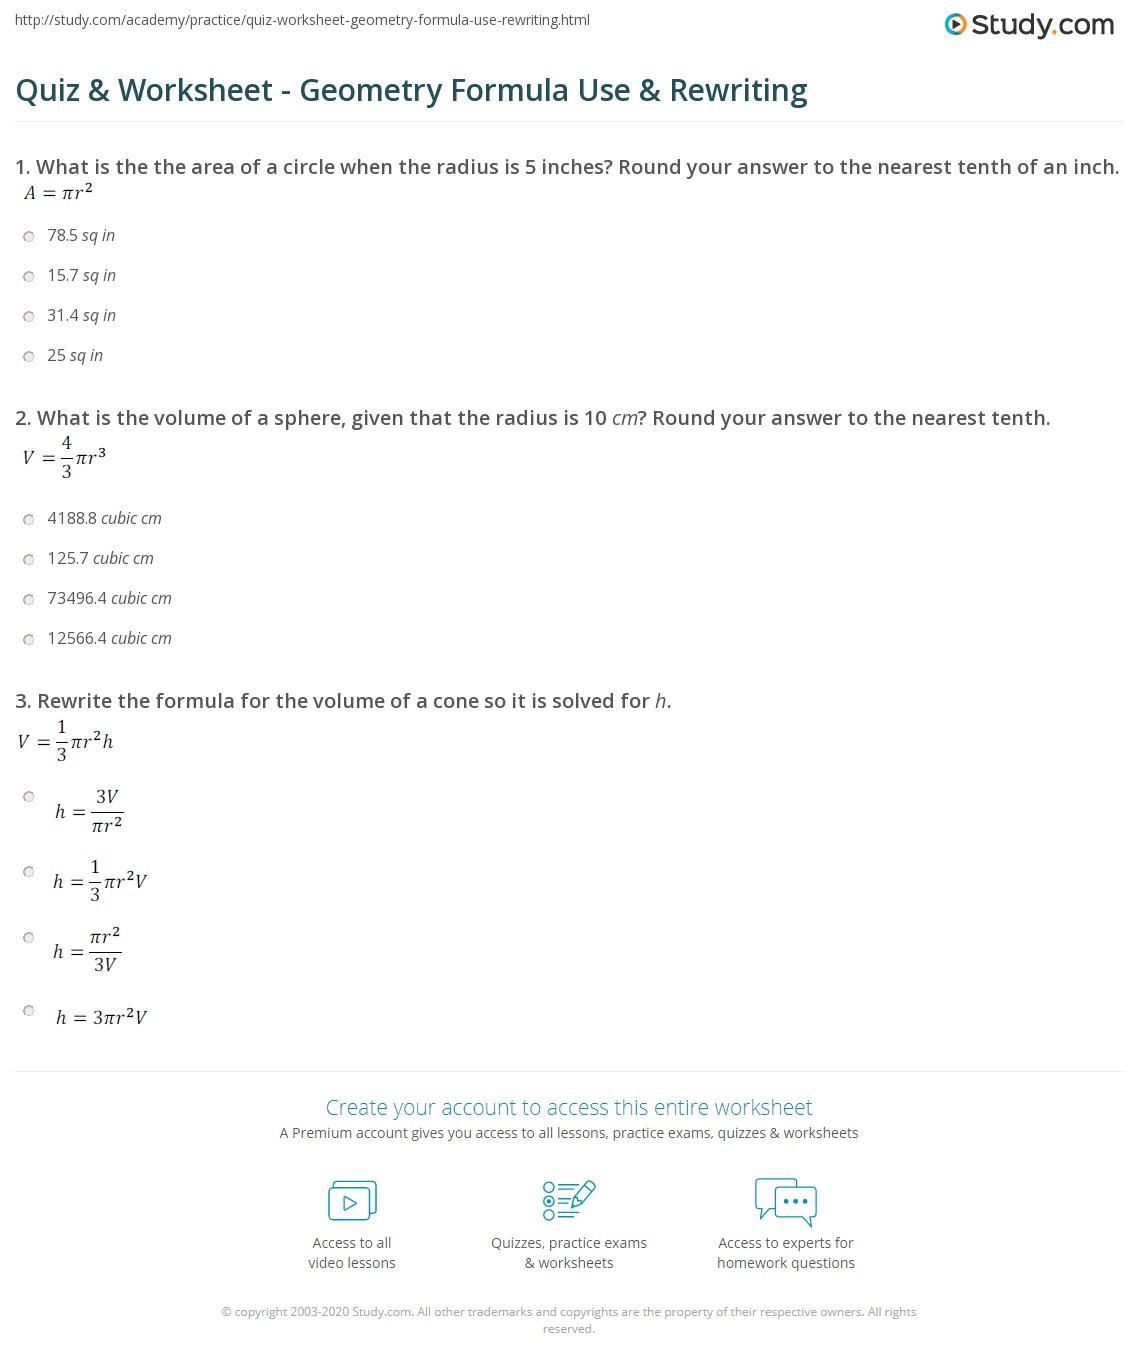 Quiz Worksheet Geometry Formula Use Rewriting